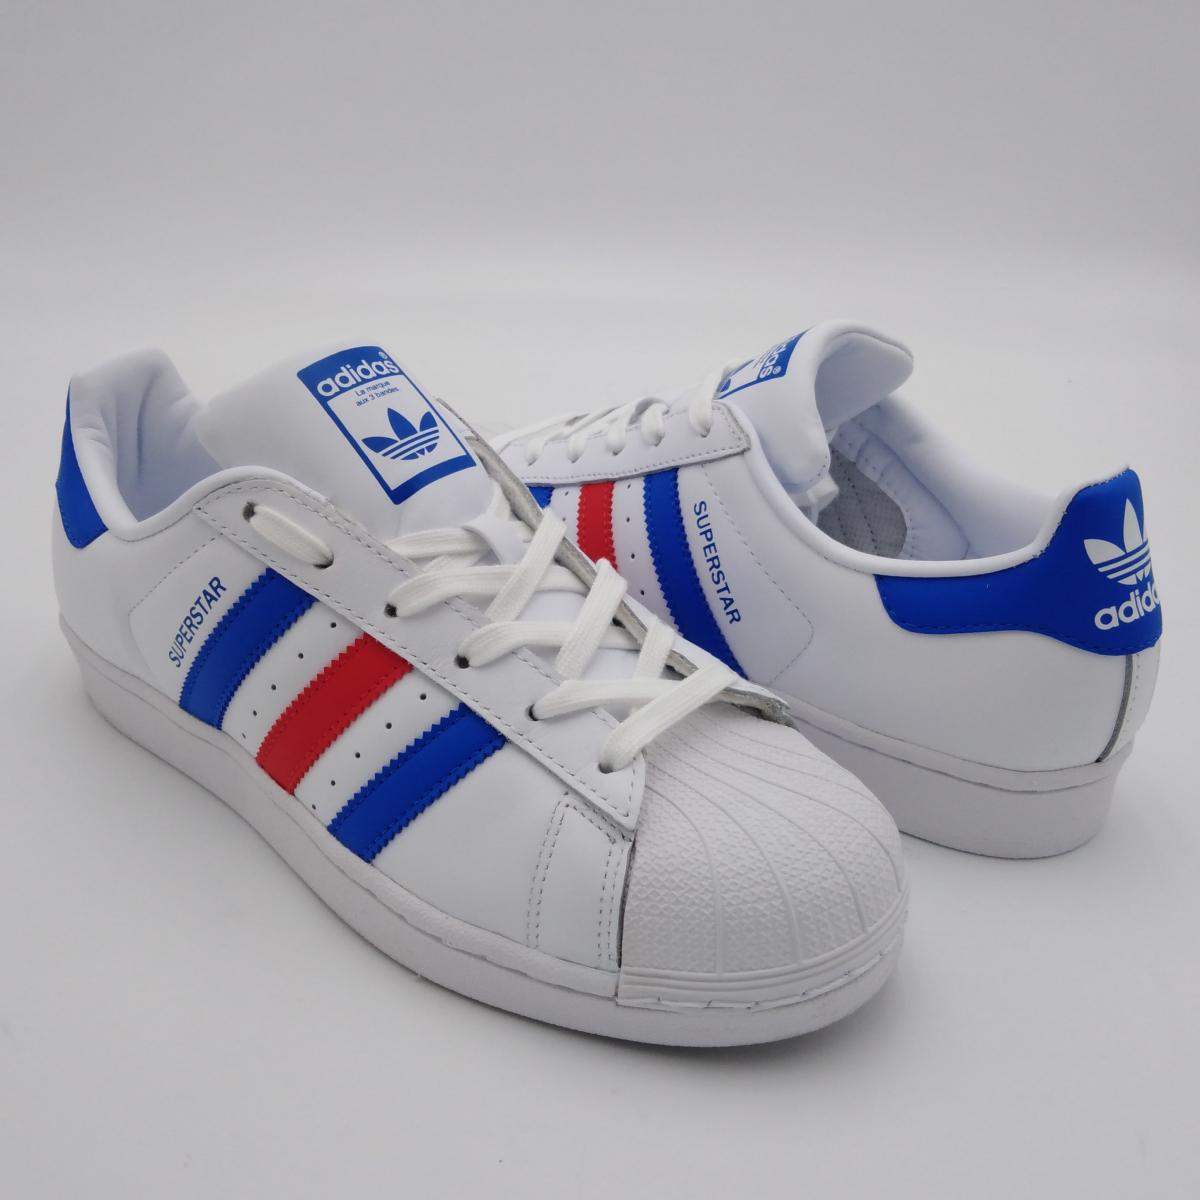 Adidas Superstar -Sneaker...